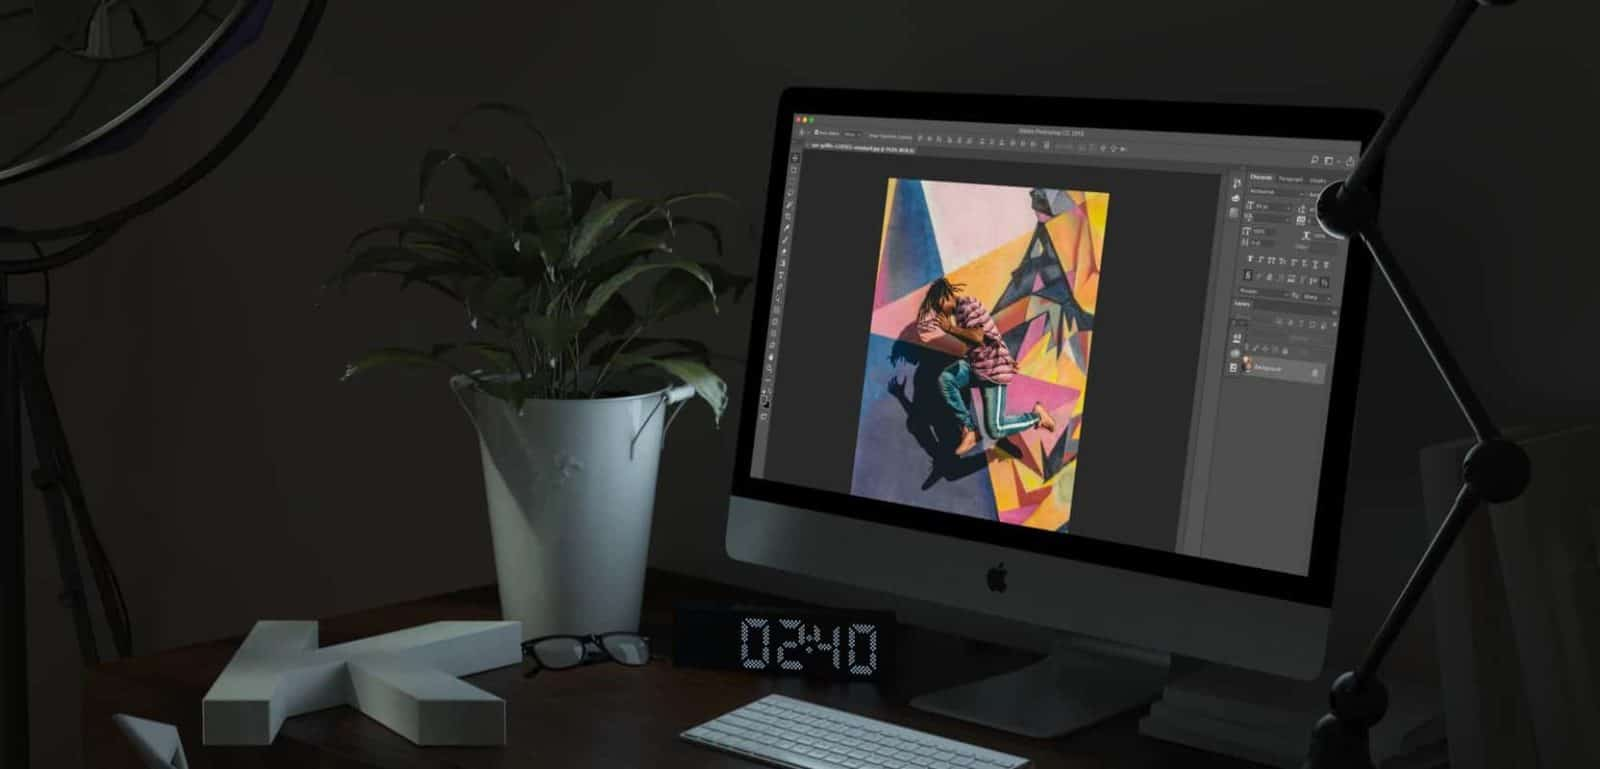 adobe photoshop running on computer